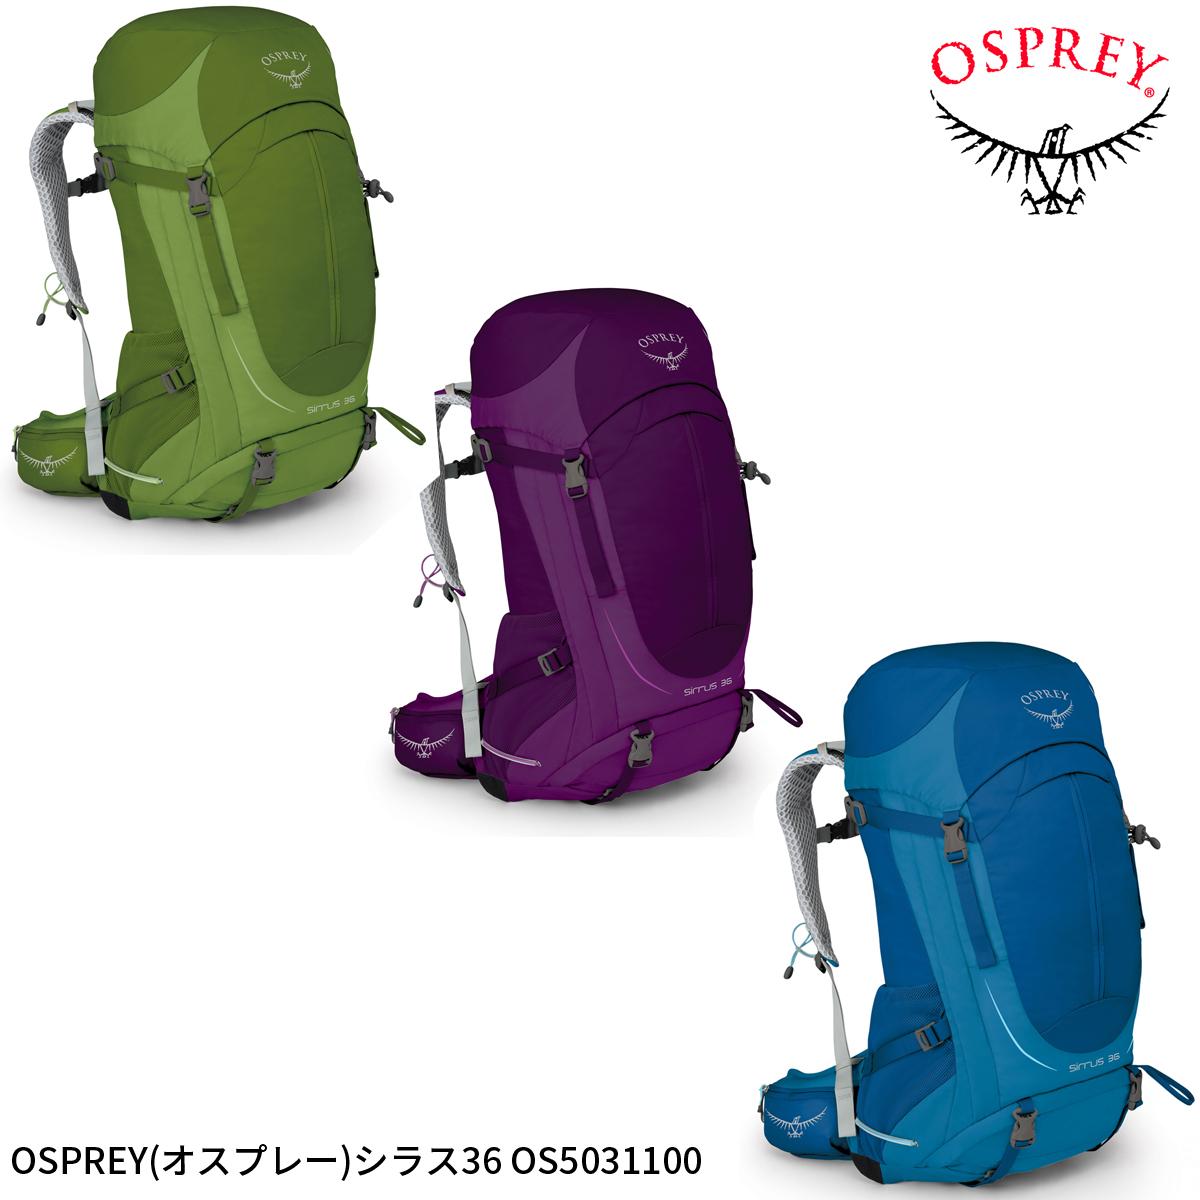 OSPREY(オスプレー)シラス36 OS5031100